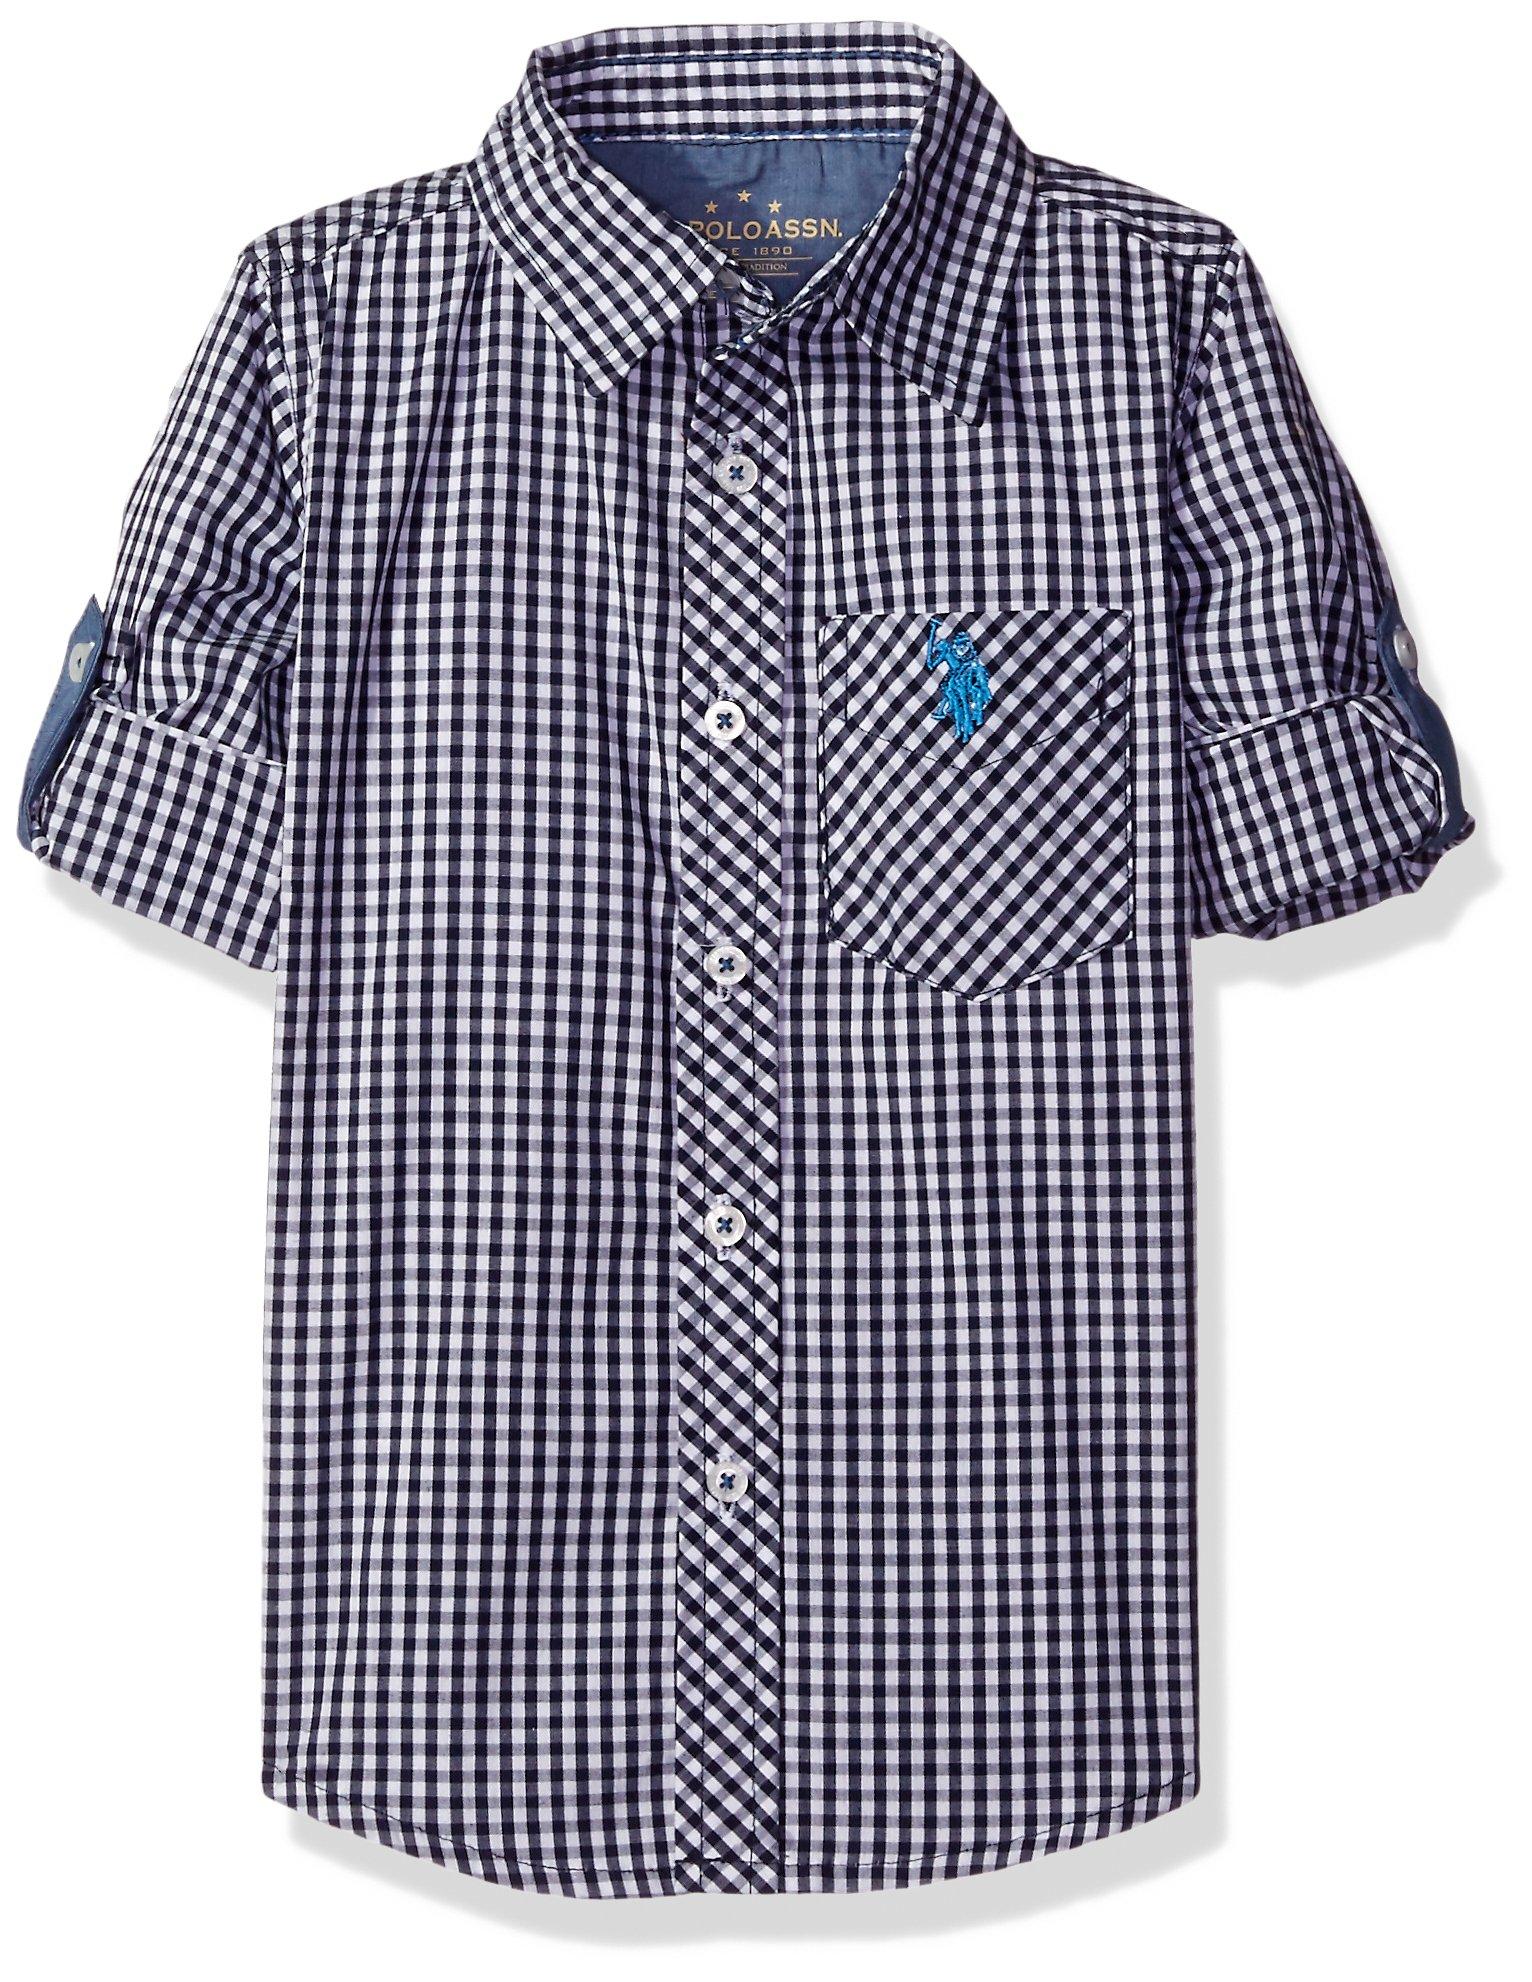 U.S. Polo Assn. Little Boys' Toddler Long Sleeve Single Pocket Sport Shirt, Classic Navy Plaid, 3T